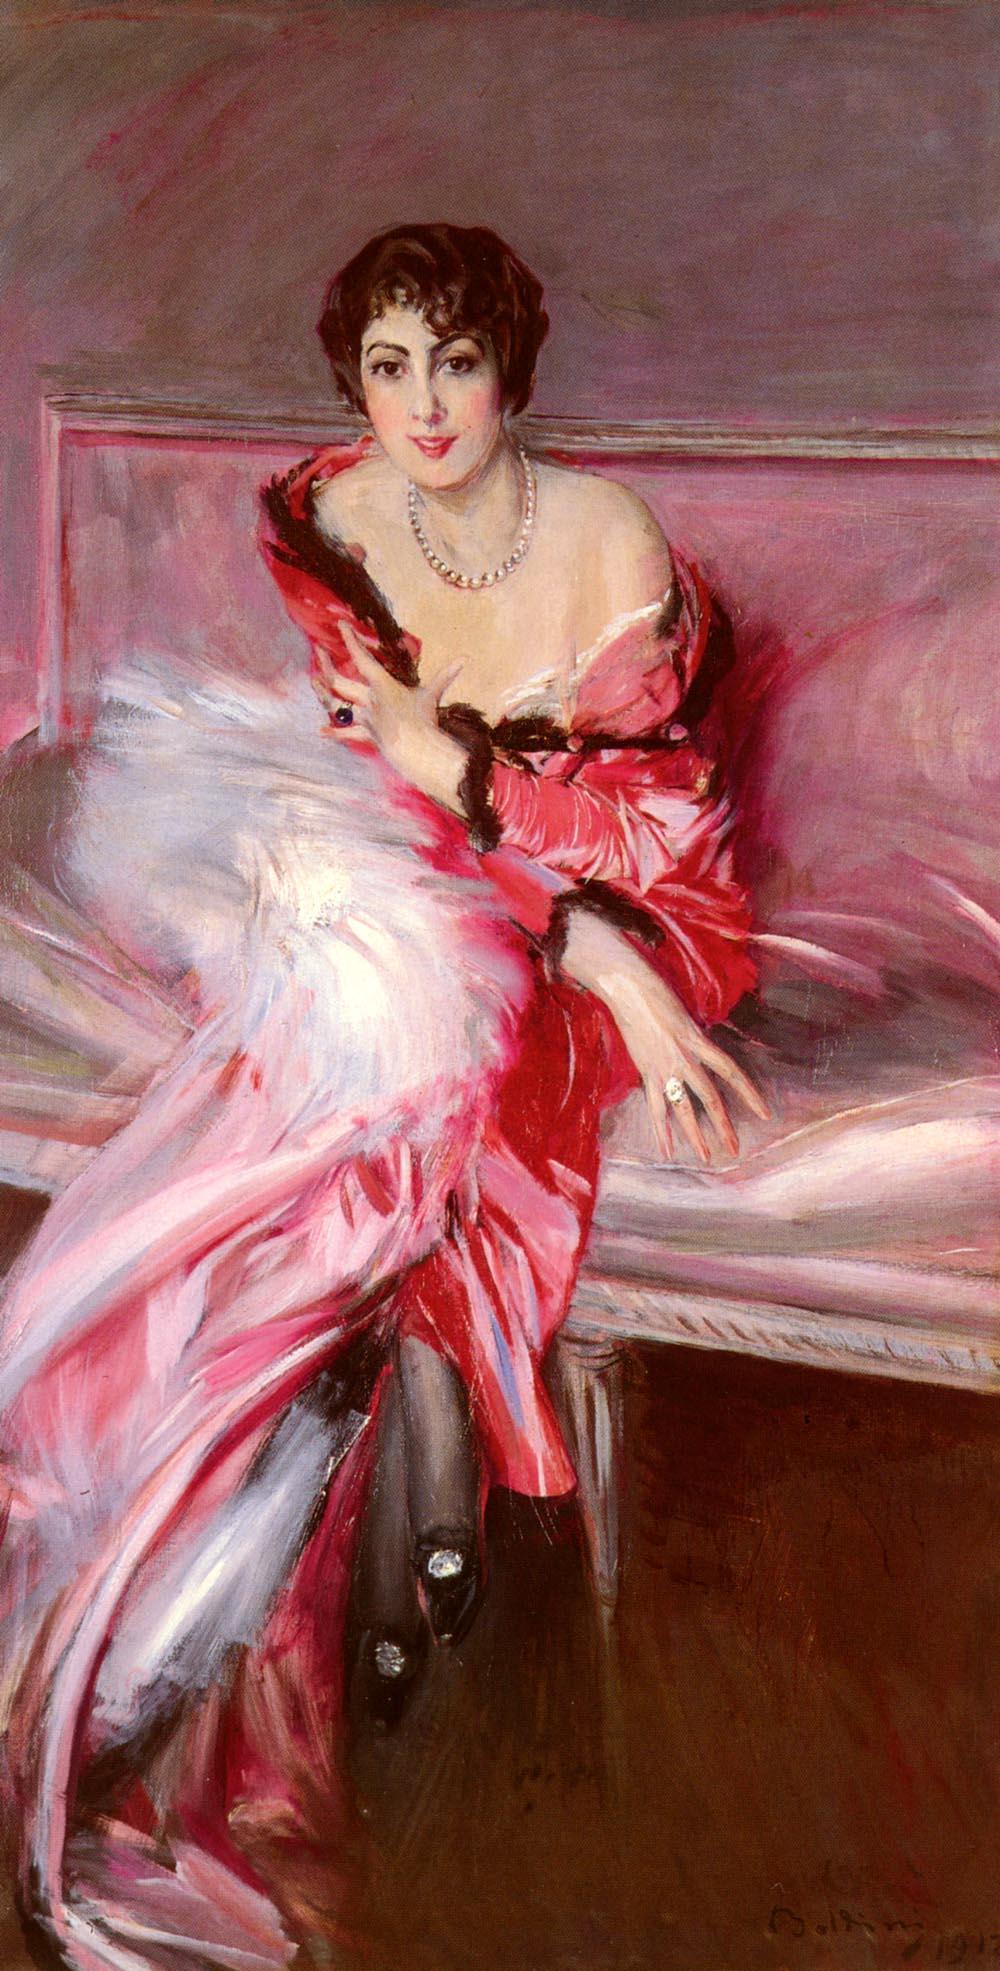 https://i1.wp.com/upload.wikimedia.org/wikipedia/commons/2/20/Boldini_-_Madame_Juillard_In_Red.jpg